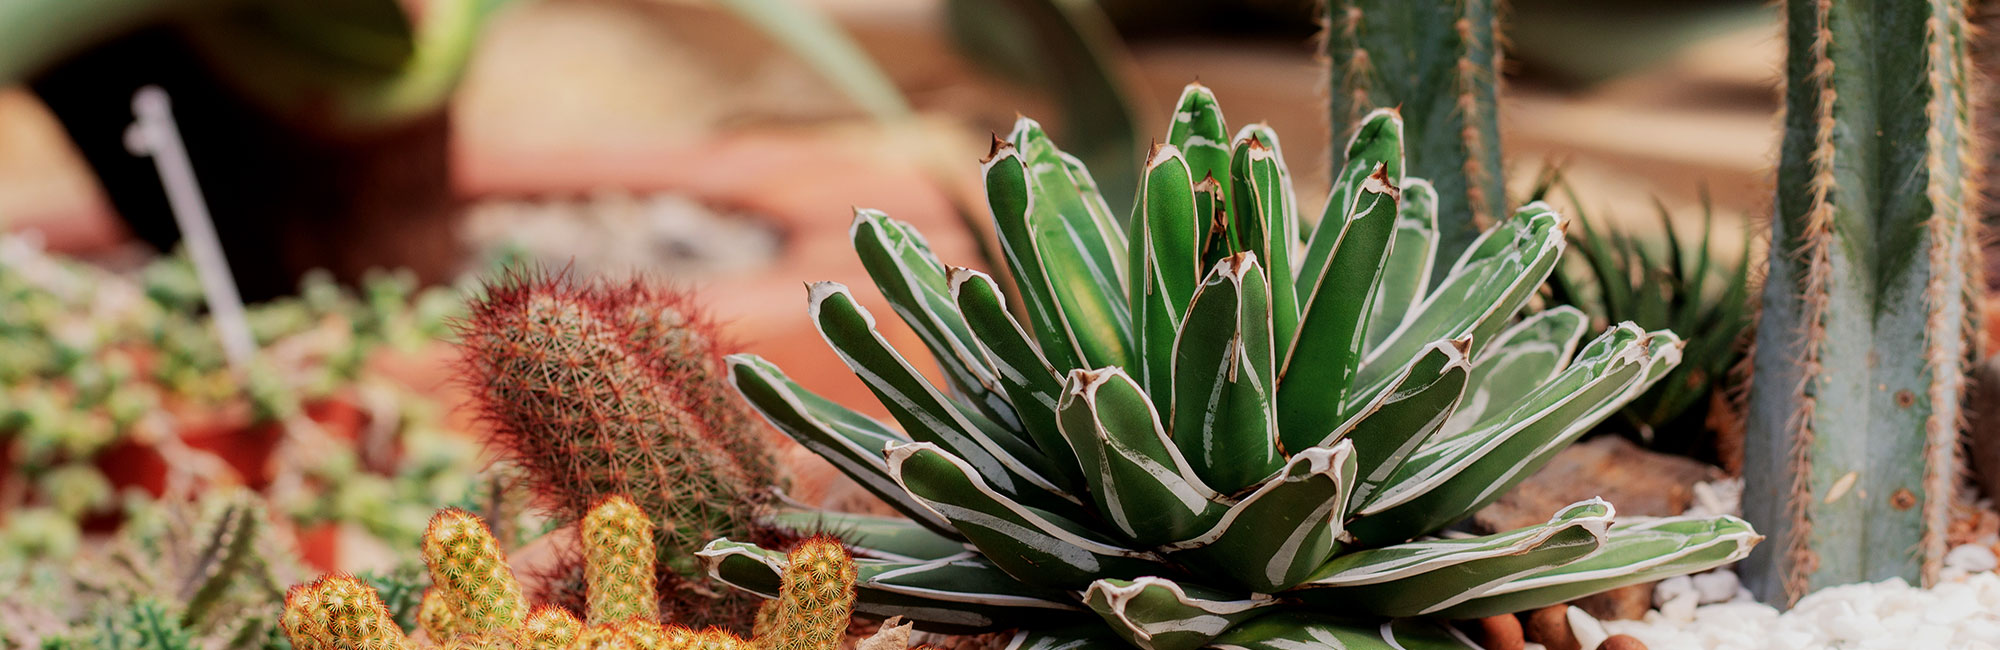 Desert Plant Tree Landscaping Nursery In Cave Creek Phoenix